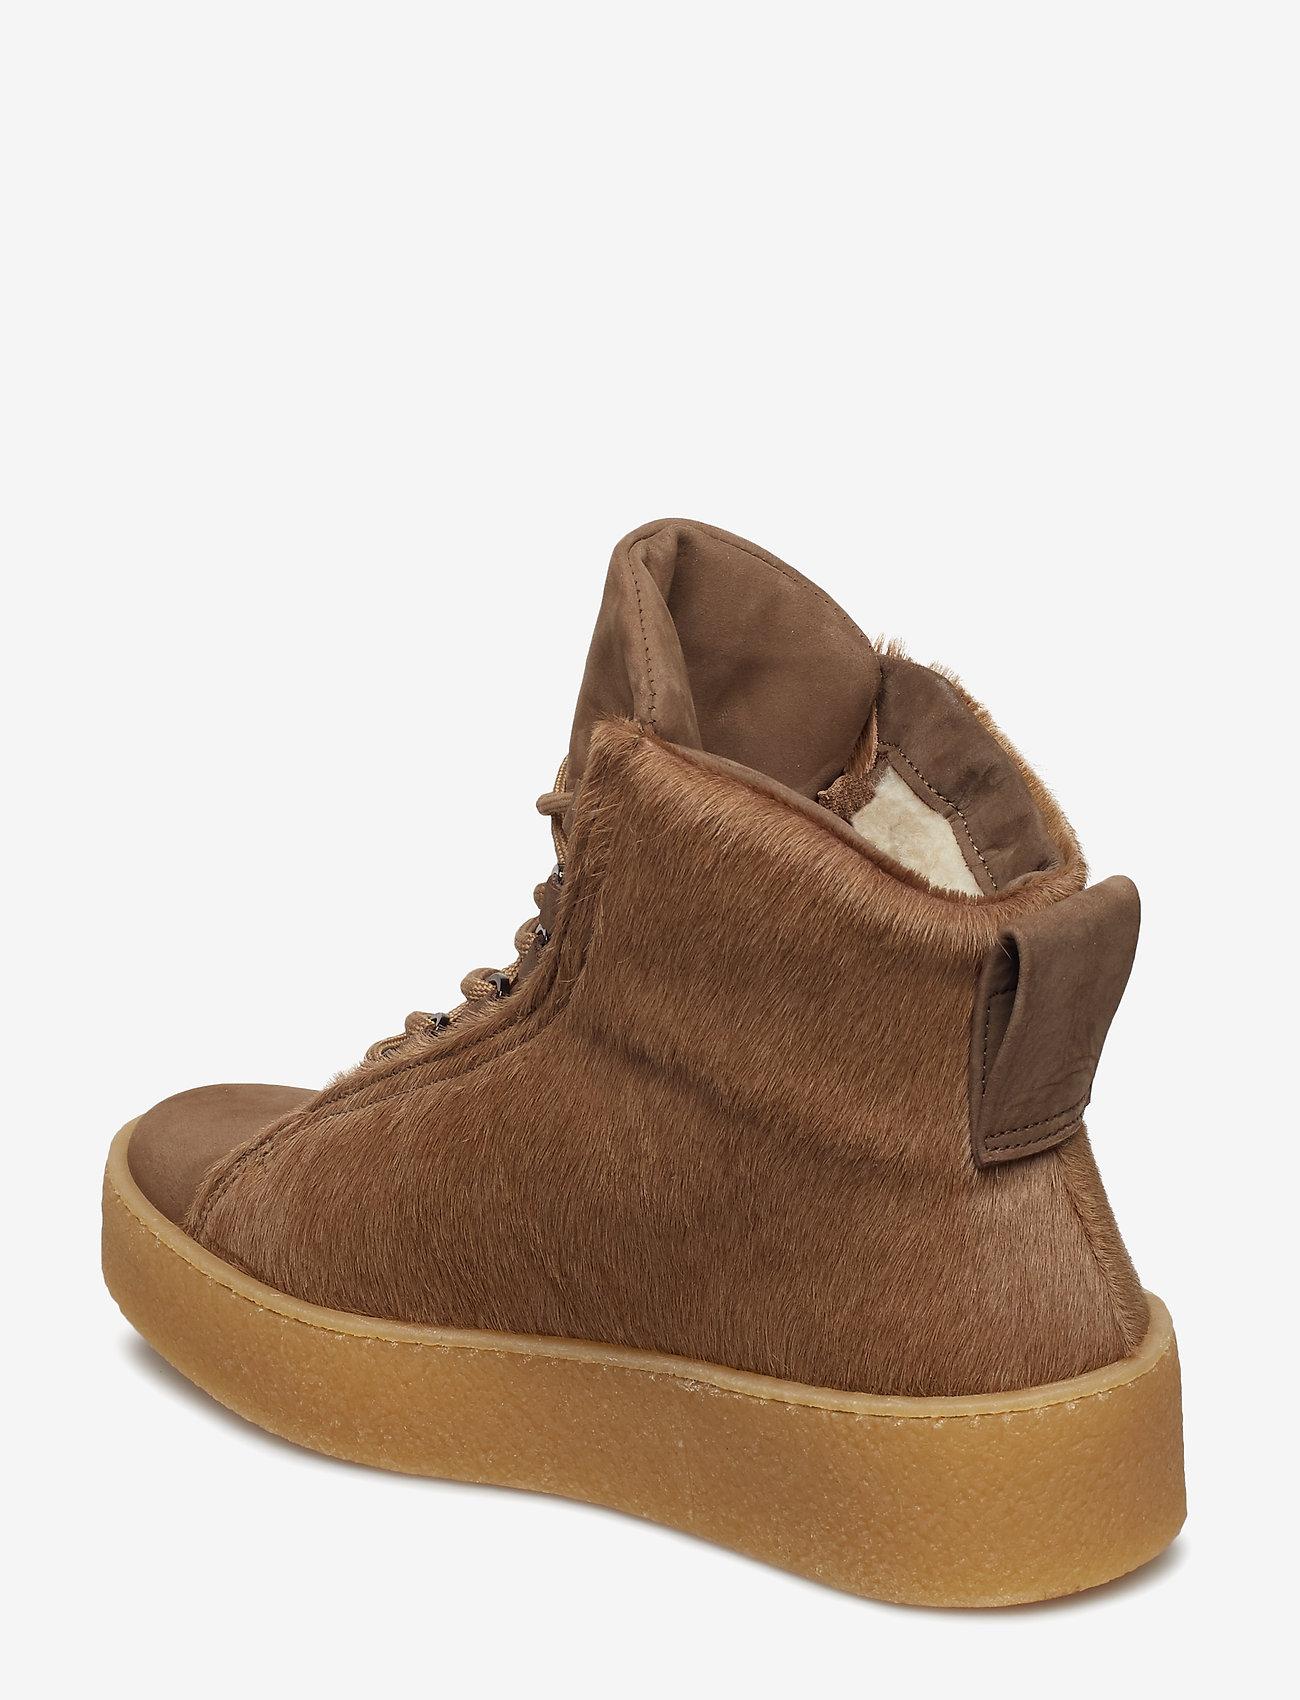 Anna Winter Laced Boot (Camel Fur) - Filippa K